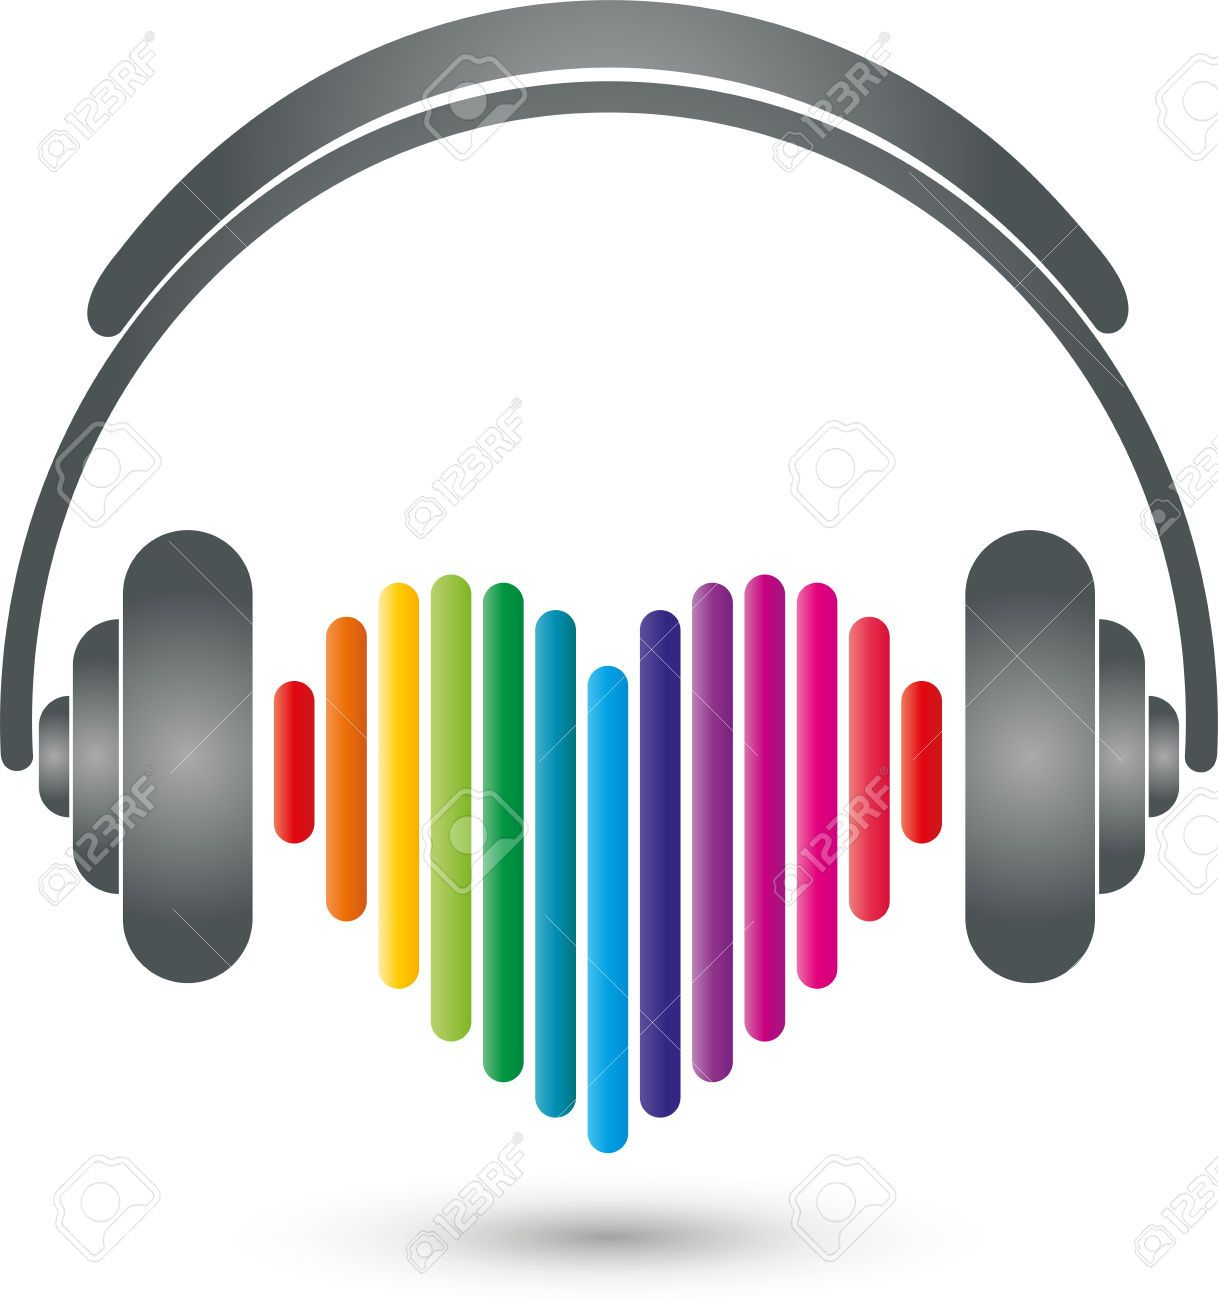 Stock vector alex s. Headphone clipart sound bar